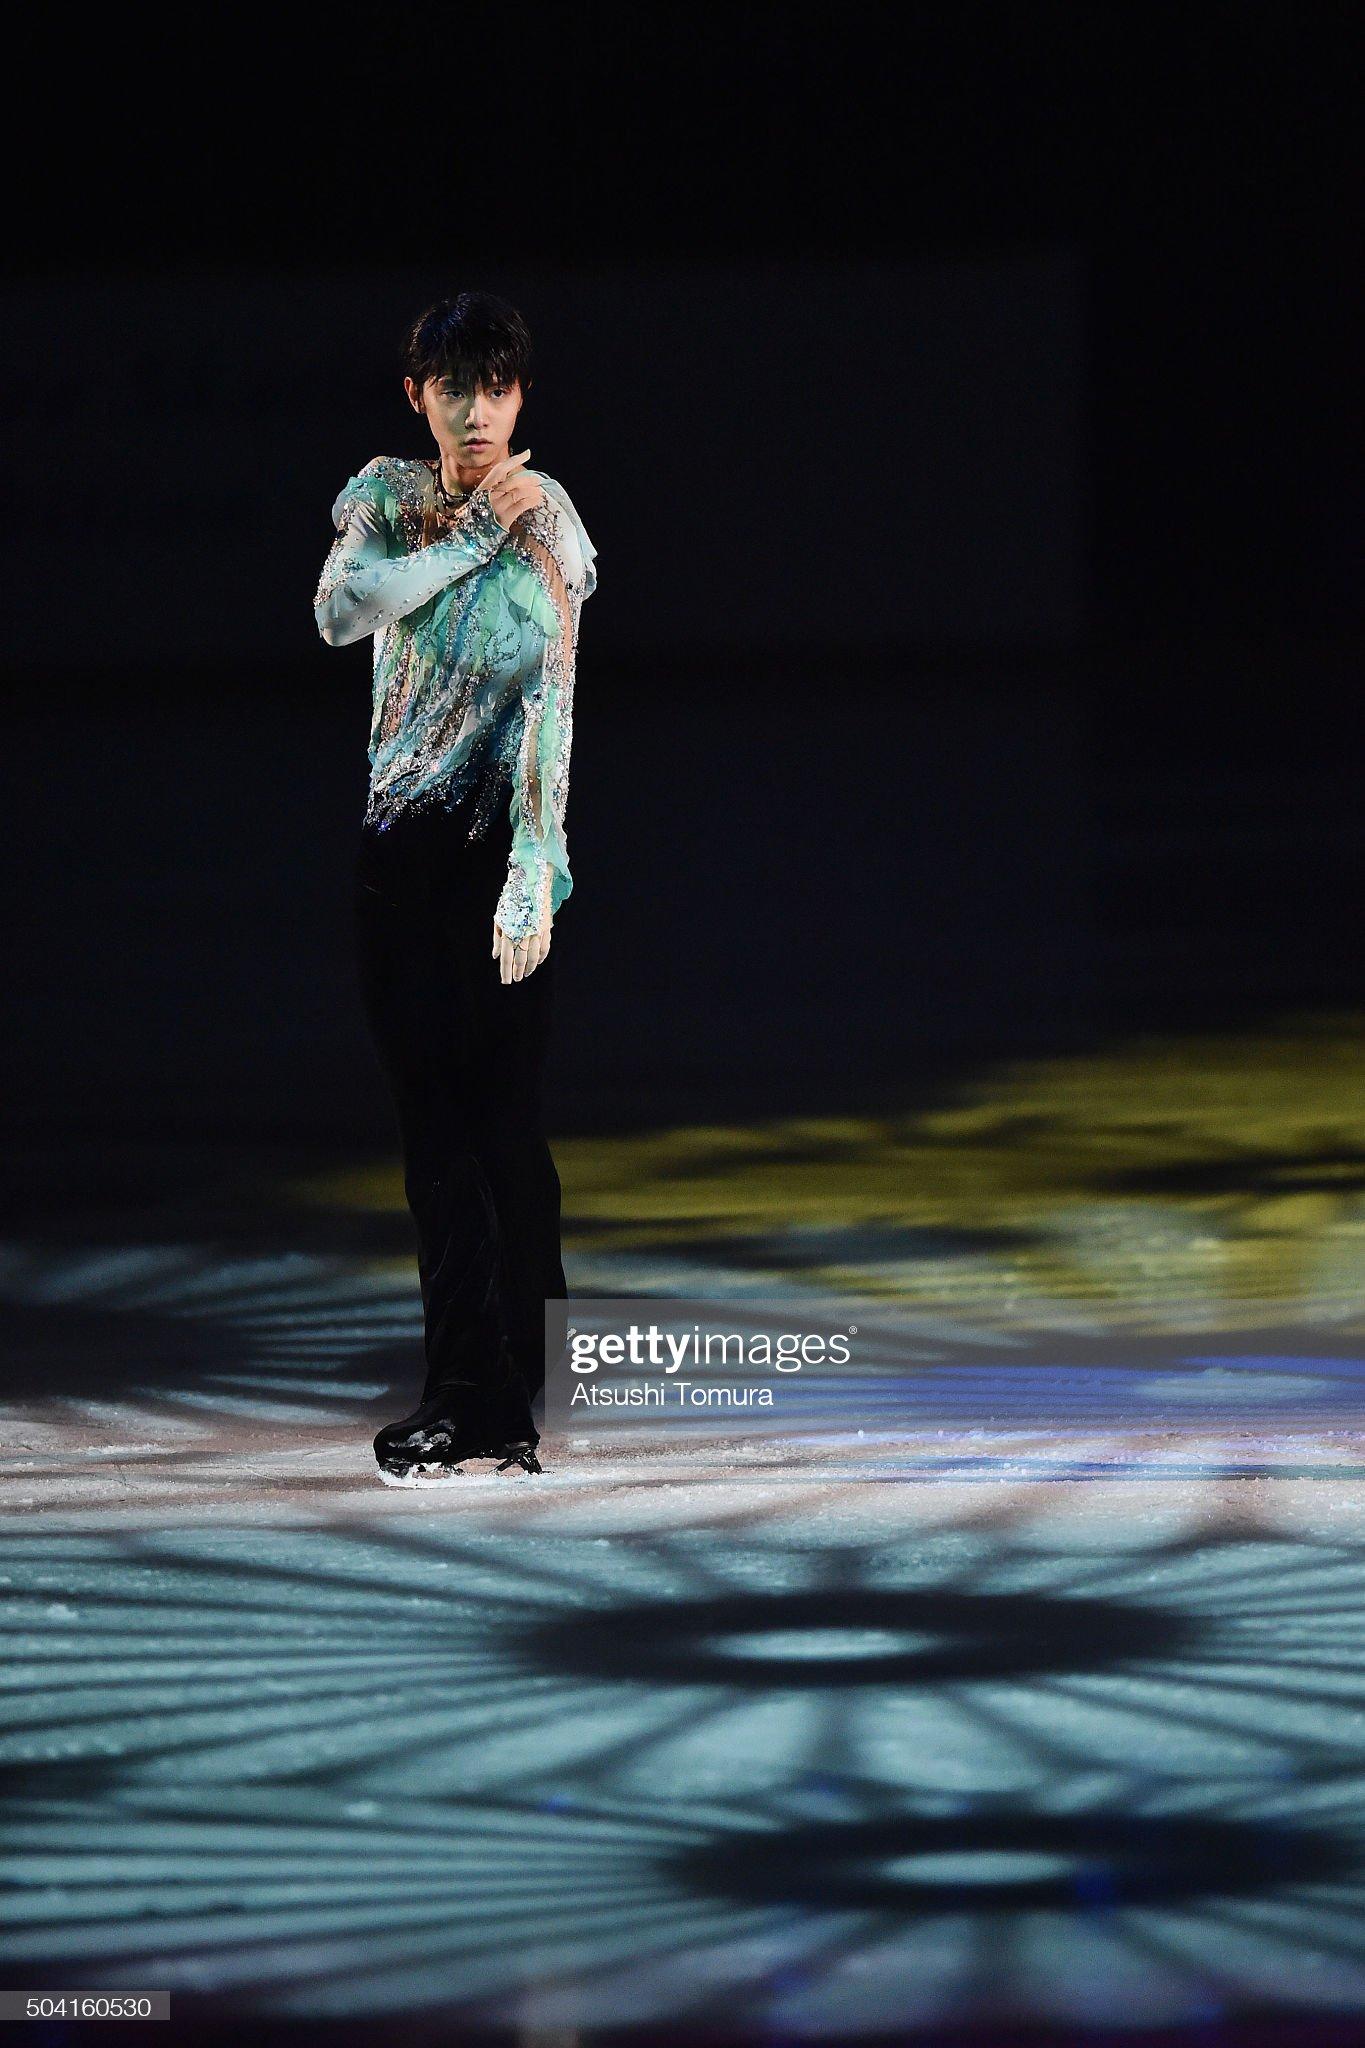 yuzuru-hanyu-of-japan-performs-his-routi